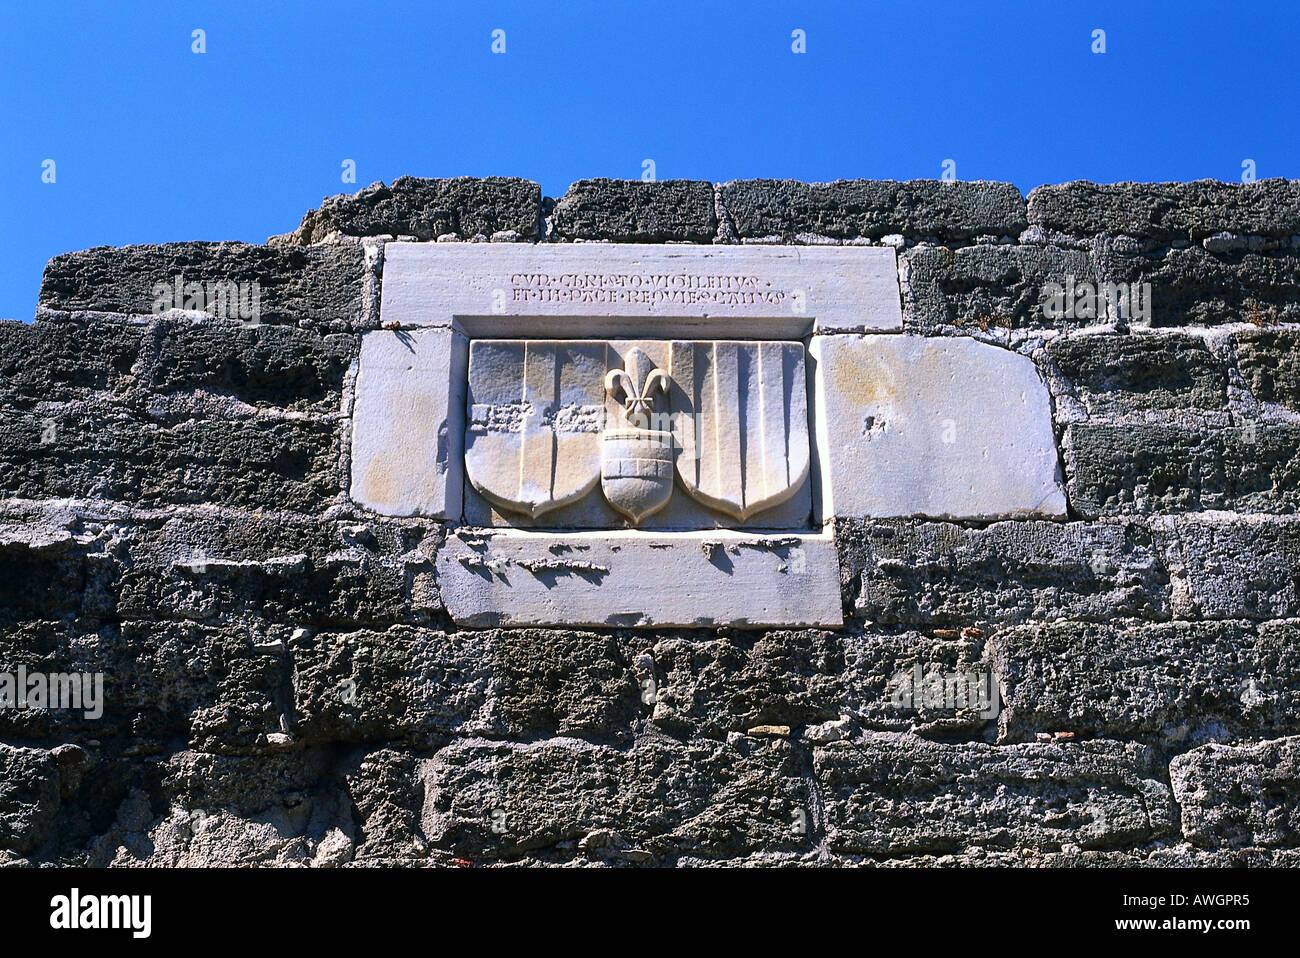 Turkey, Aegean Region, Bodrum, Castle of St Peter, heraldic relief carving on castle walls - Stock Image